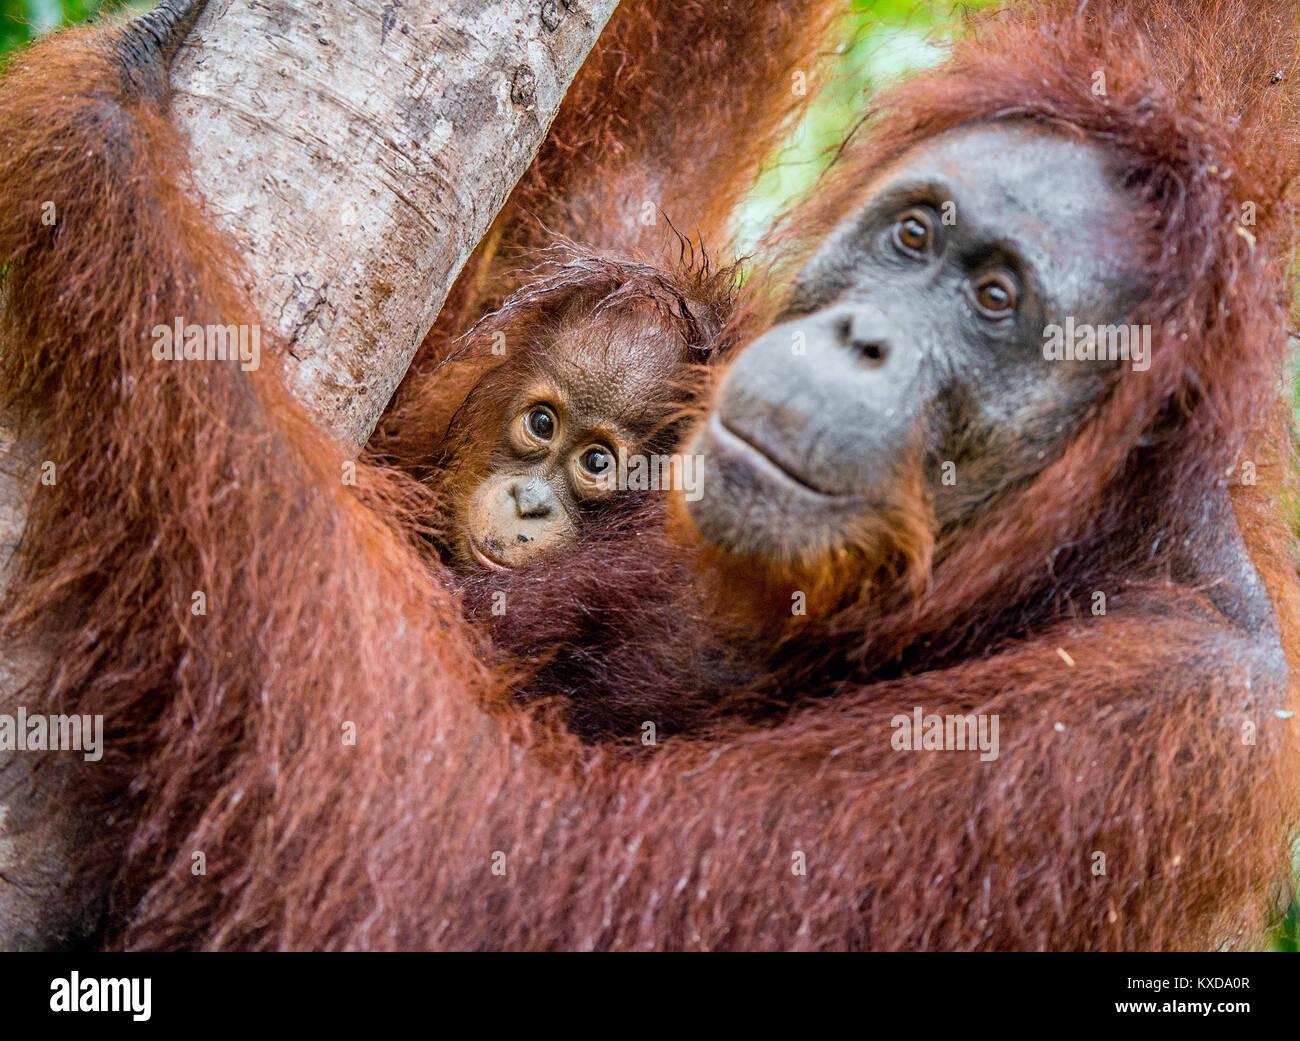 A female of the orangutan with a cub in a natural habitat.  Central Bornean orangutan (Pongo pygmaeus wurmbii) in - Stock Image